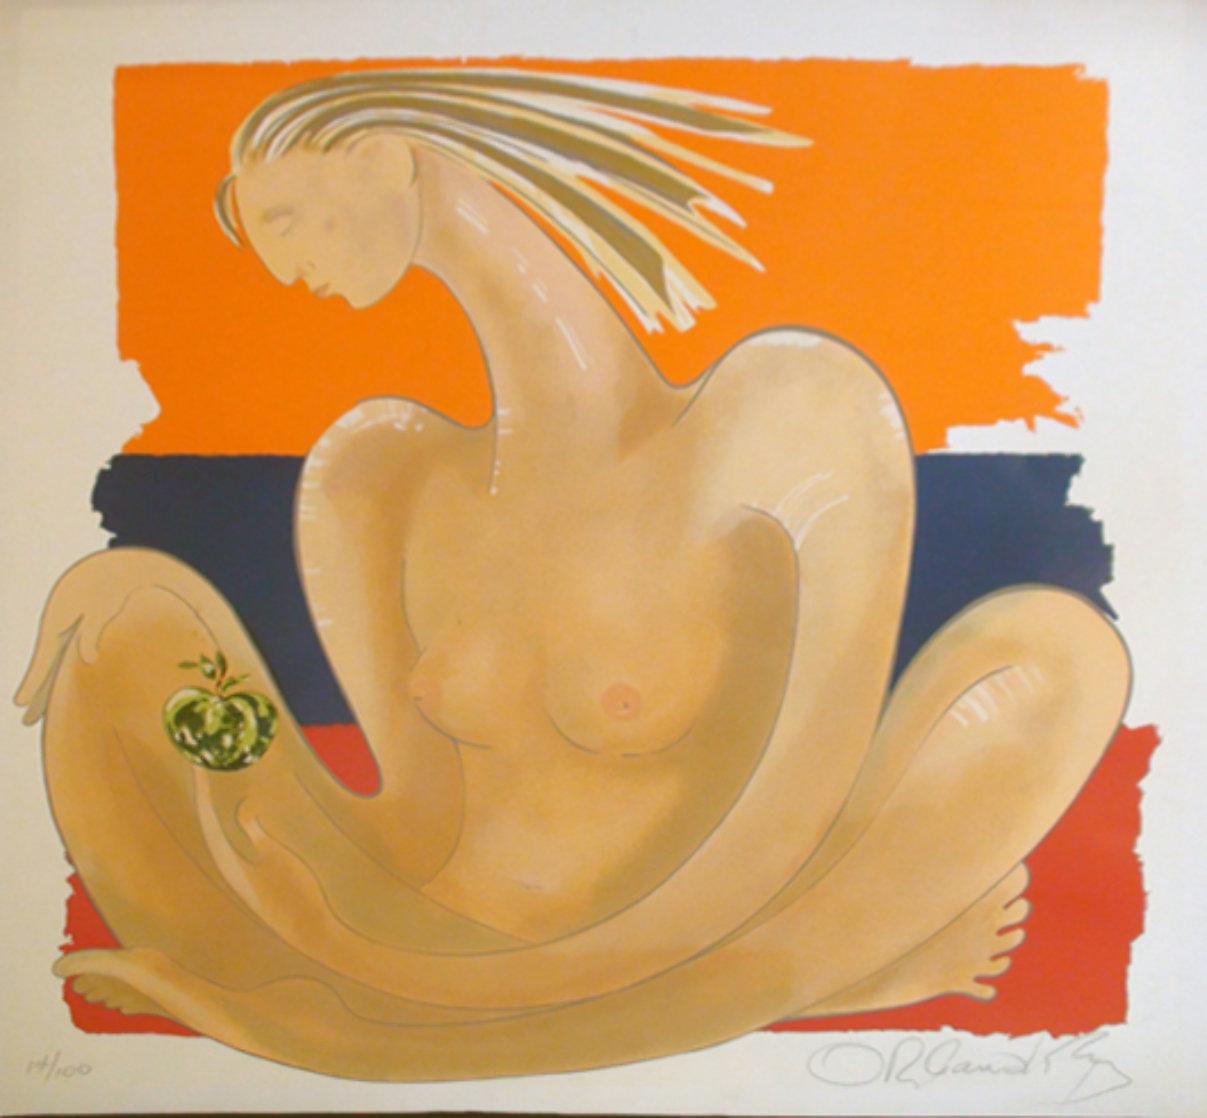 Herencia 1984 (Early) Limited Edition Print by Agudelo-Botero Orlando (Orlando A.B.)